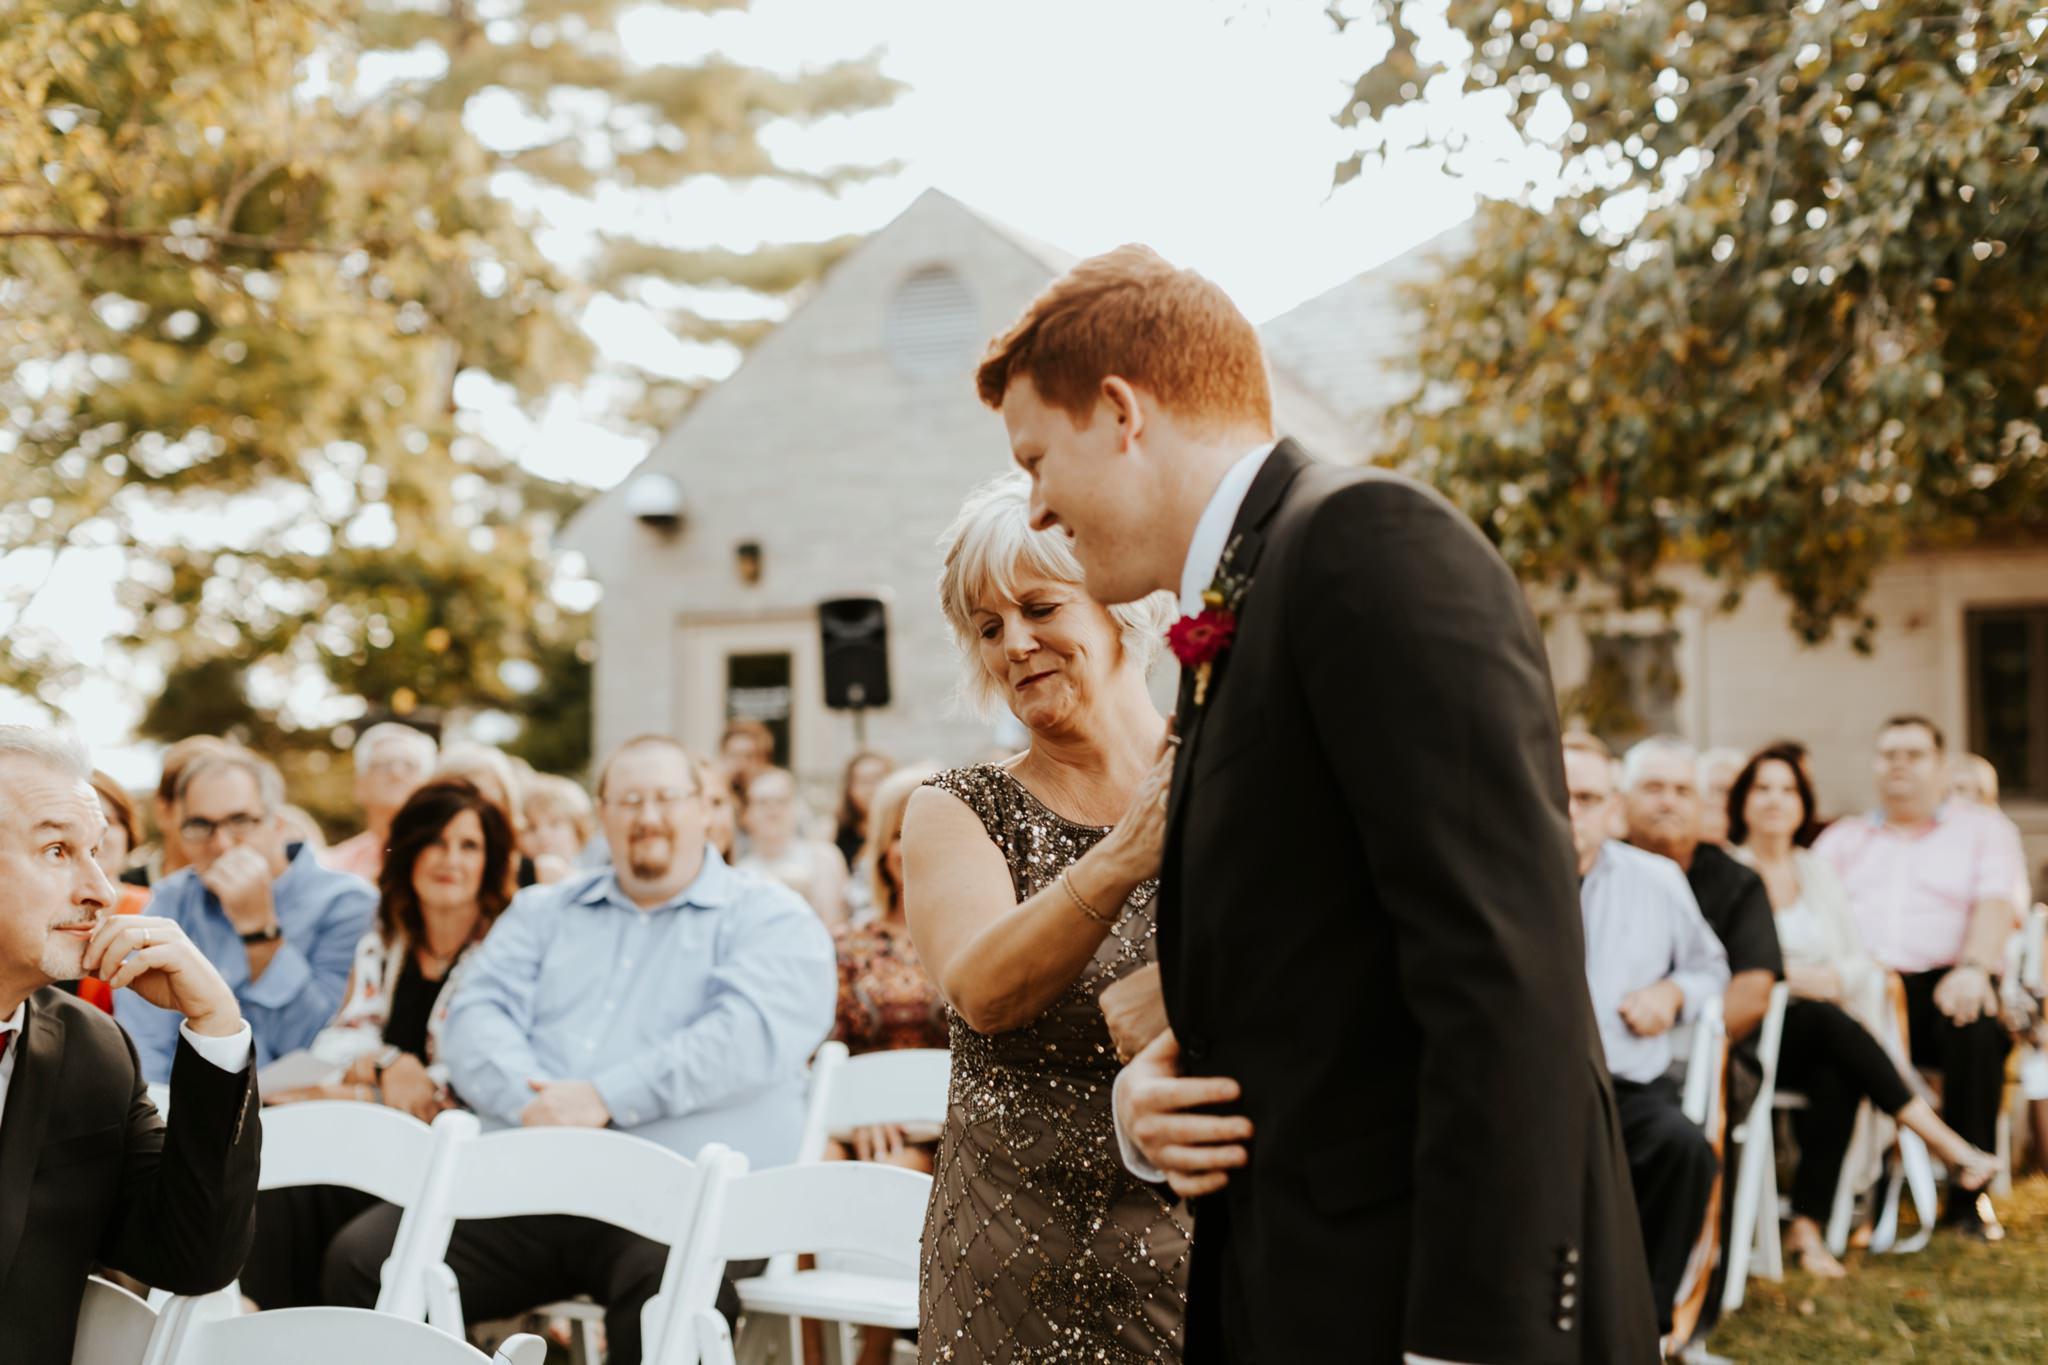 17-09-15 Lindsey and Brandon Wedding Edited-633_WEB.jpg